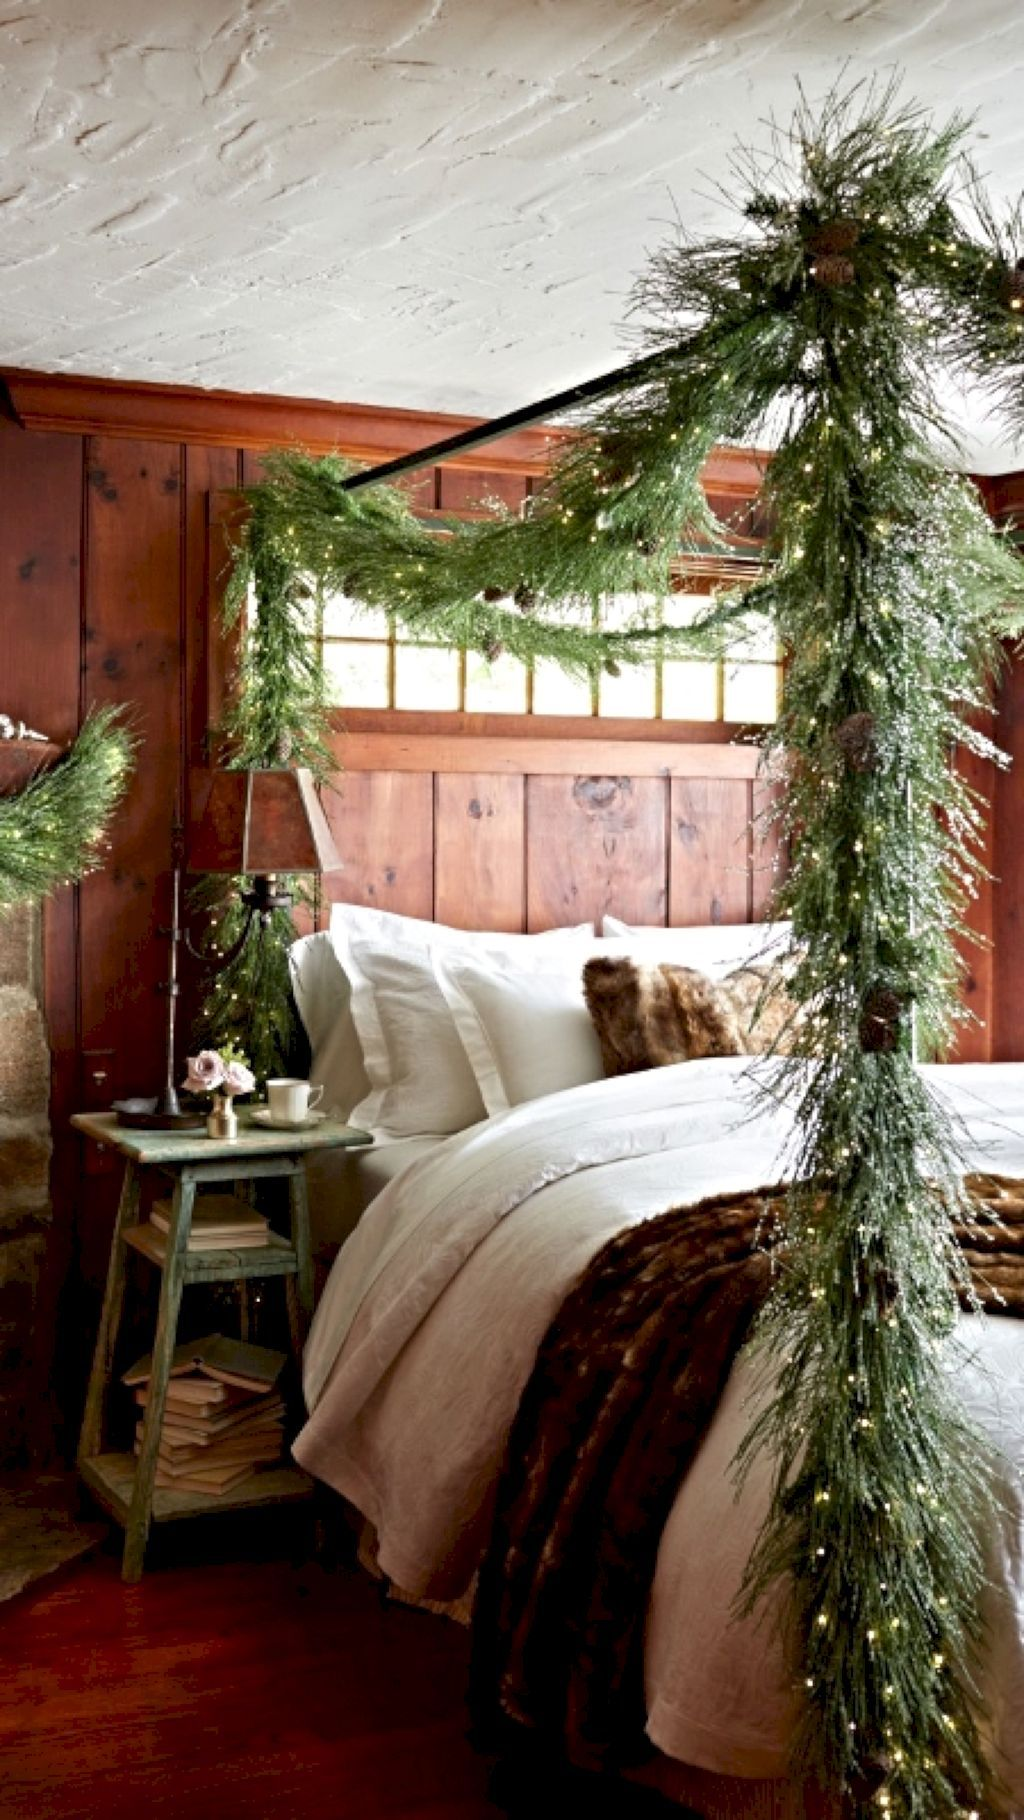 Traditional romantic master bedroom decor   Comfy Christmas Bedroom Decor Ideas  Christmas bedroom Bedrooms